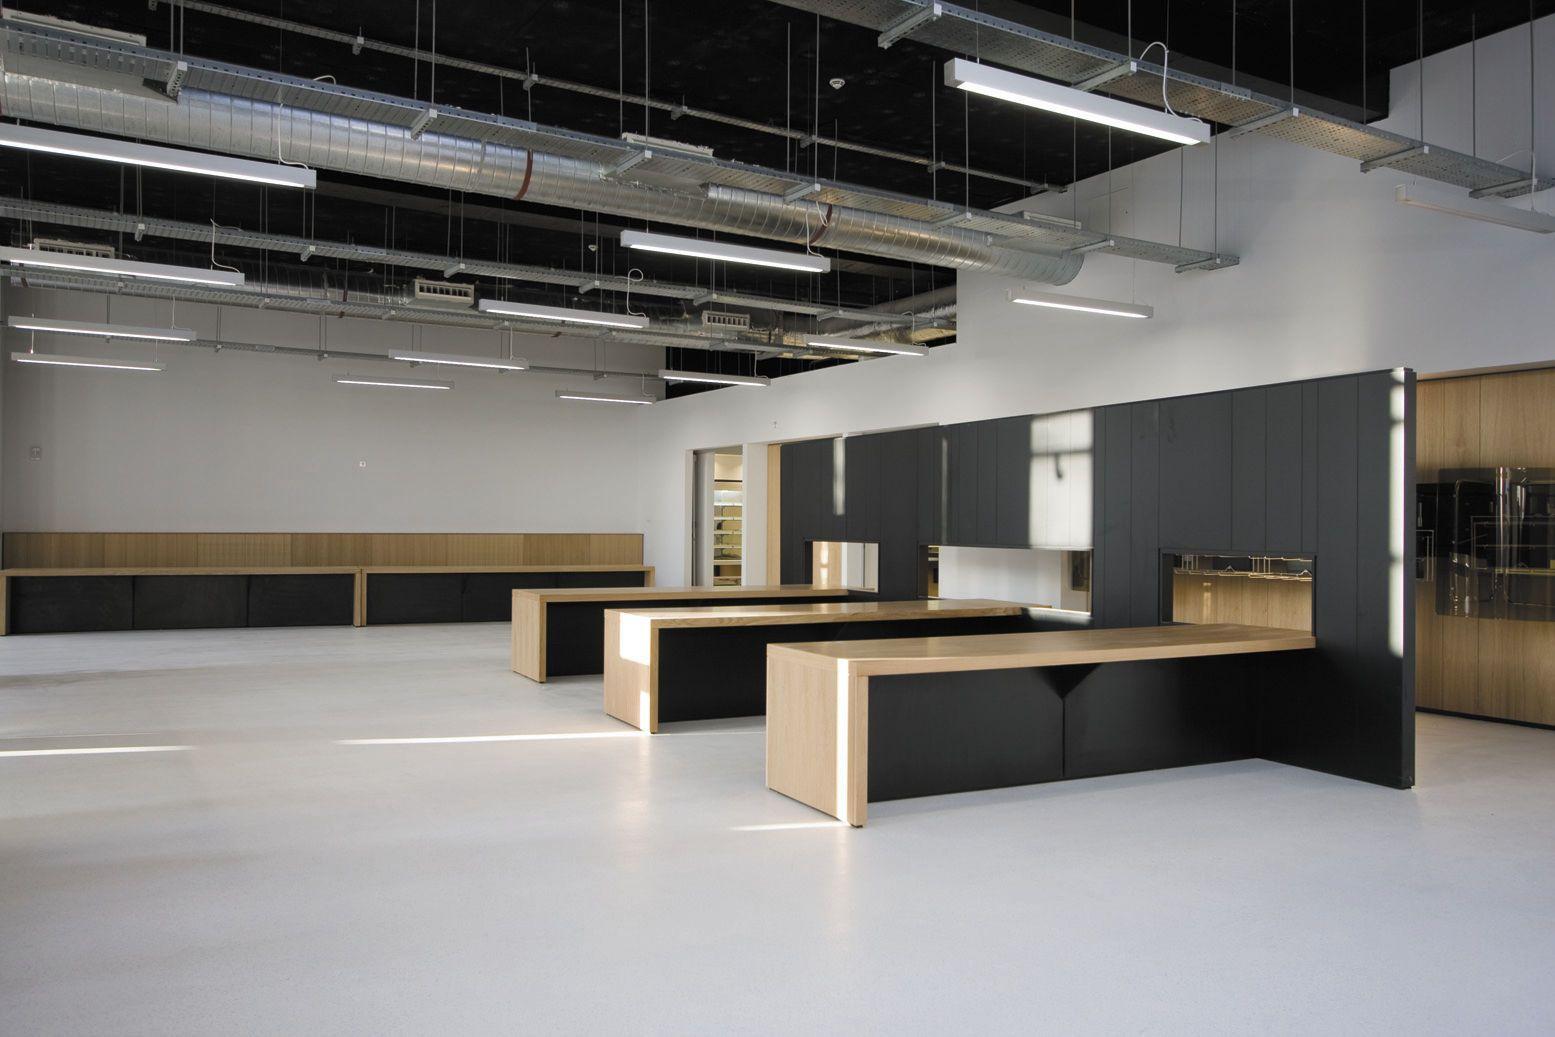 Office Pendant Lighting Fixtures | Lighting Ideas